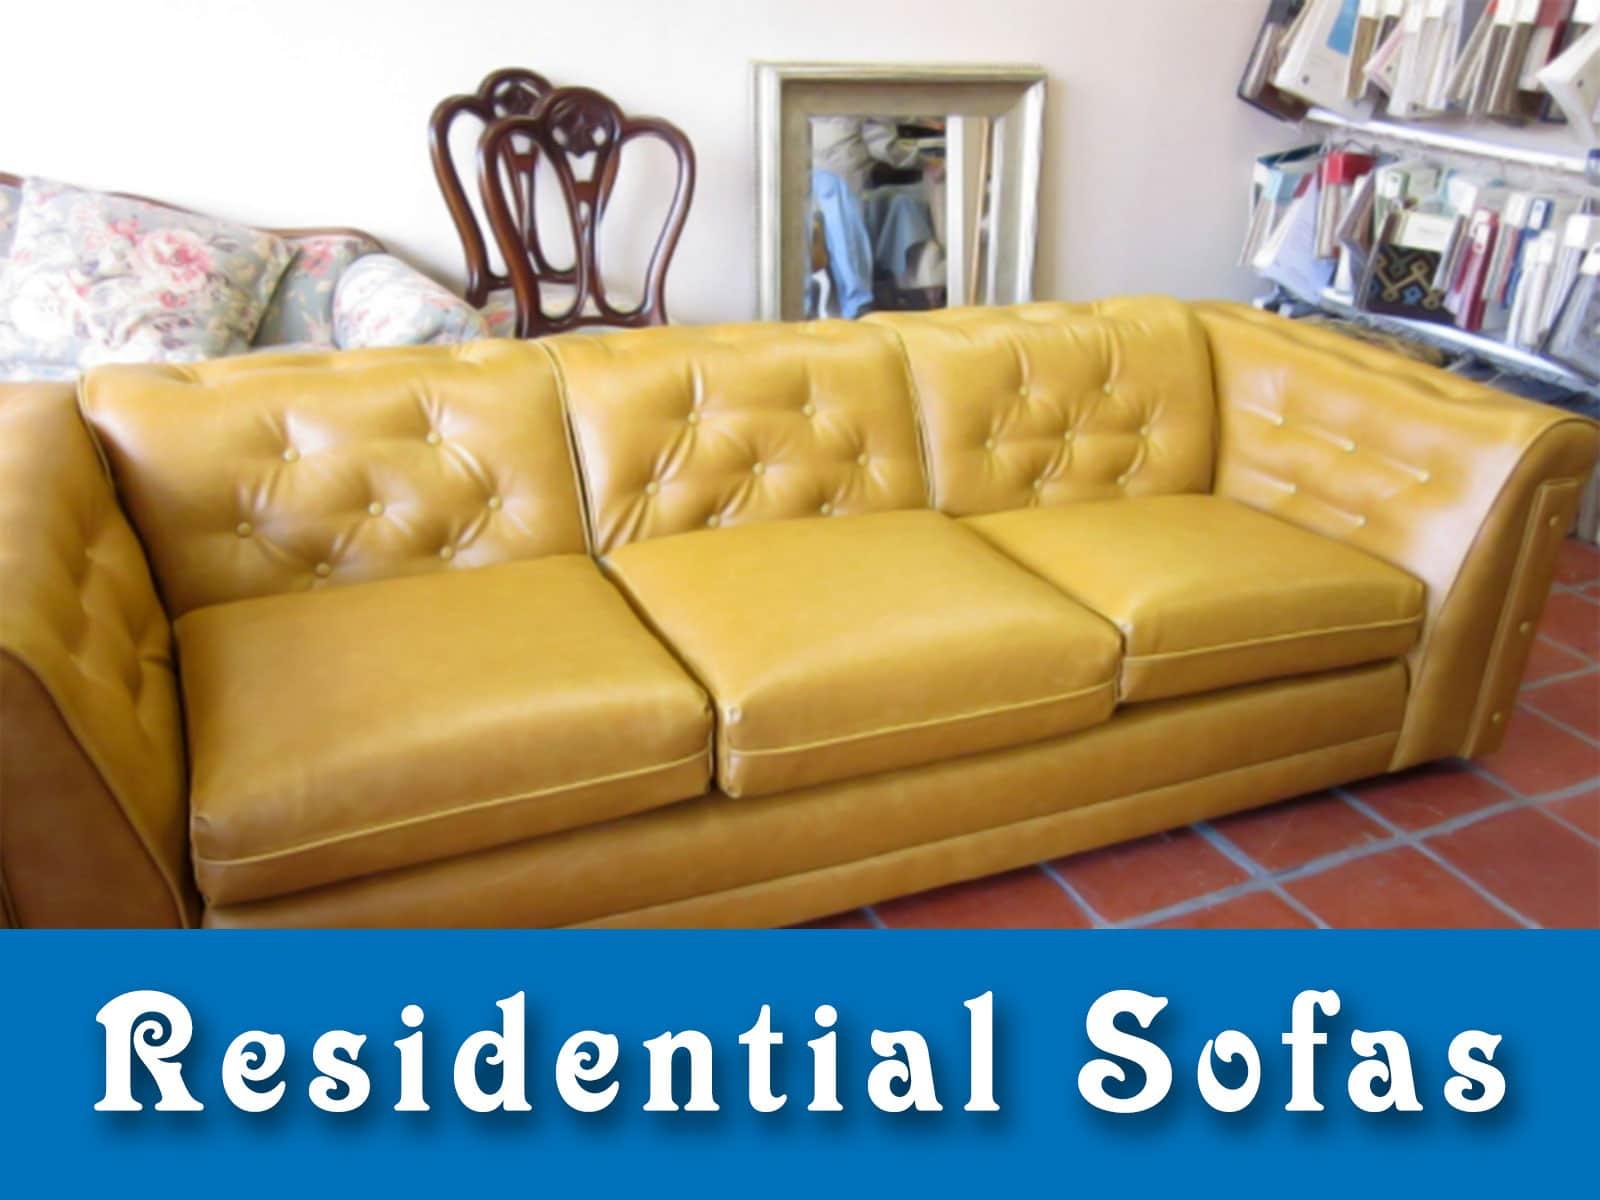 custom sofa los angeles ca bed king size philippines 2 upholstery santa monica made sofas